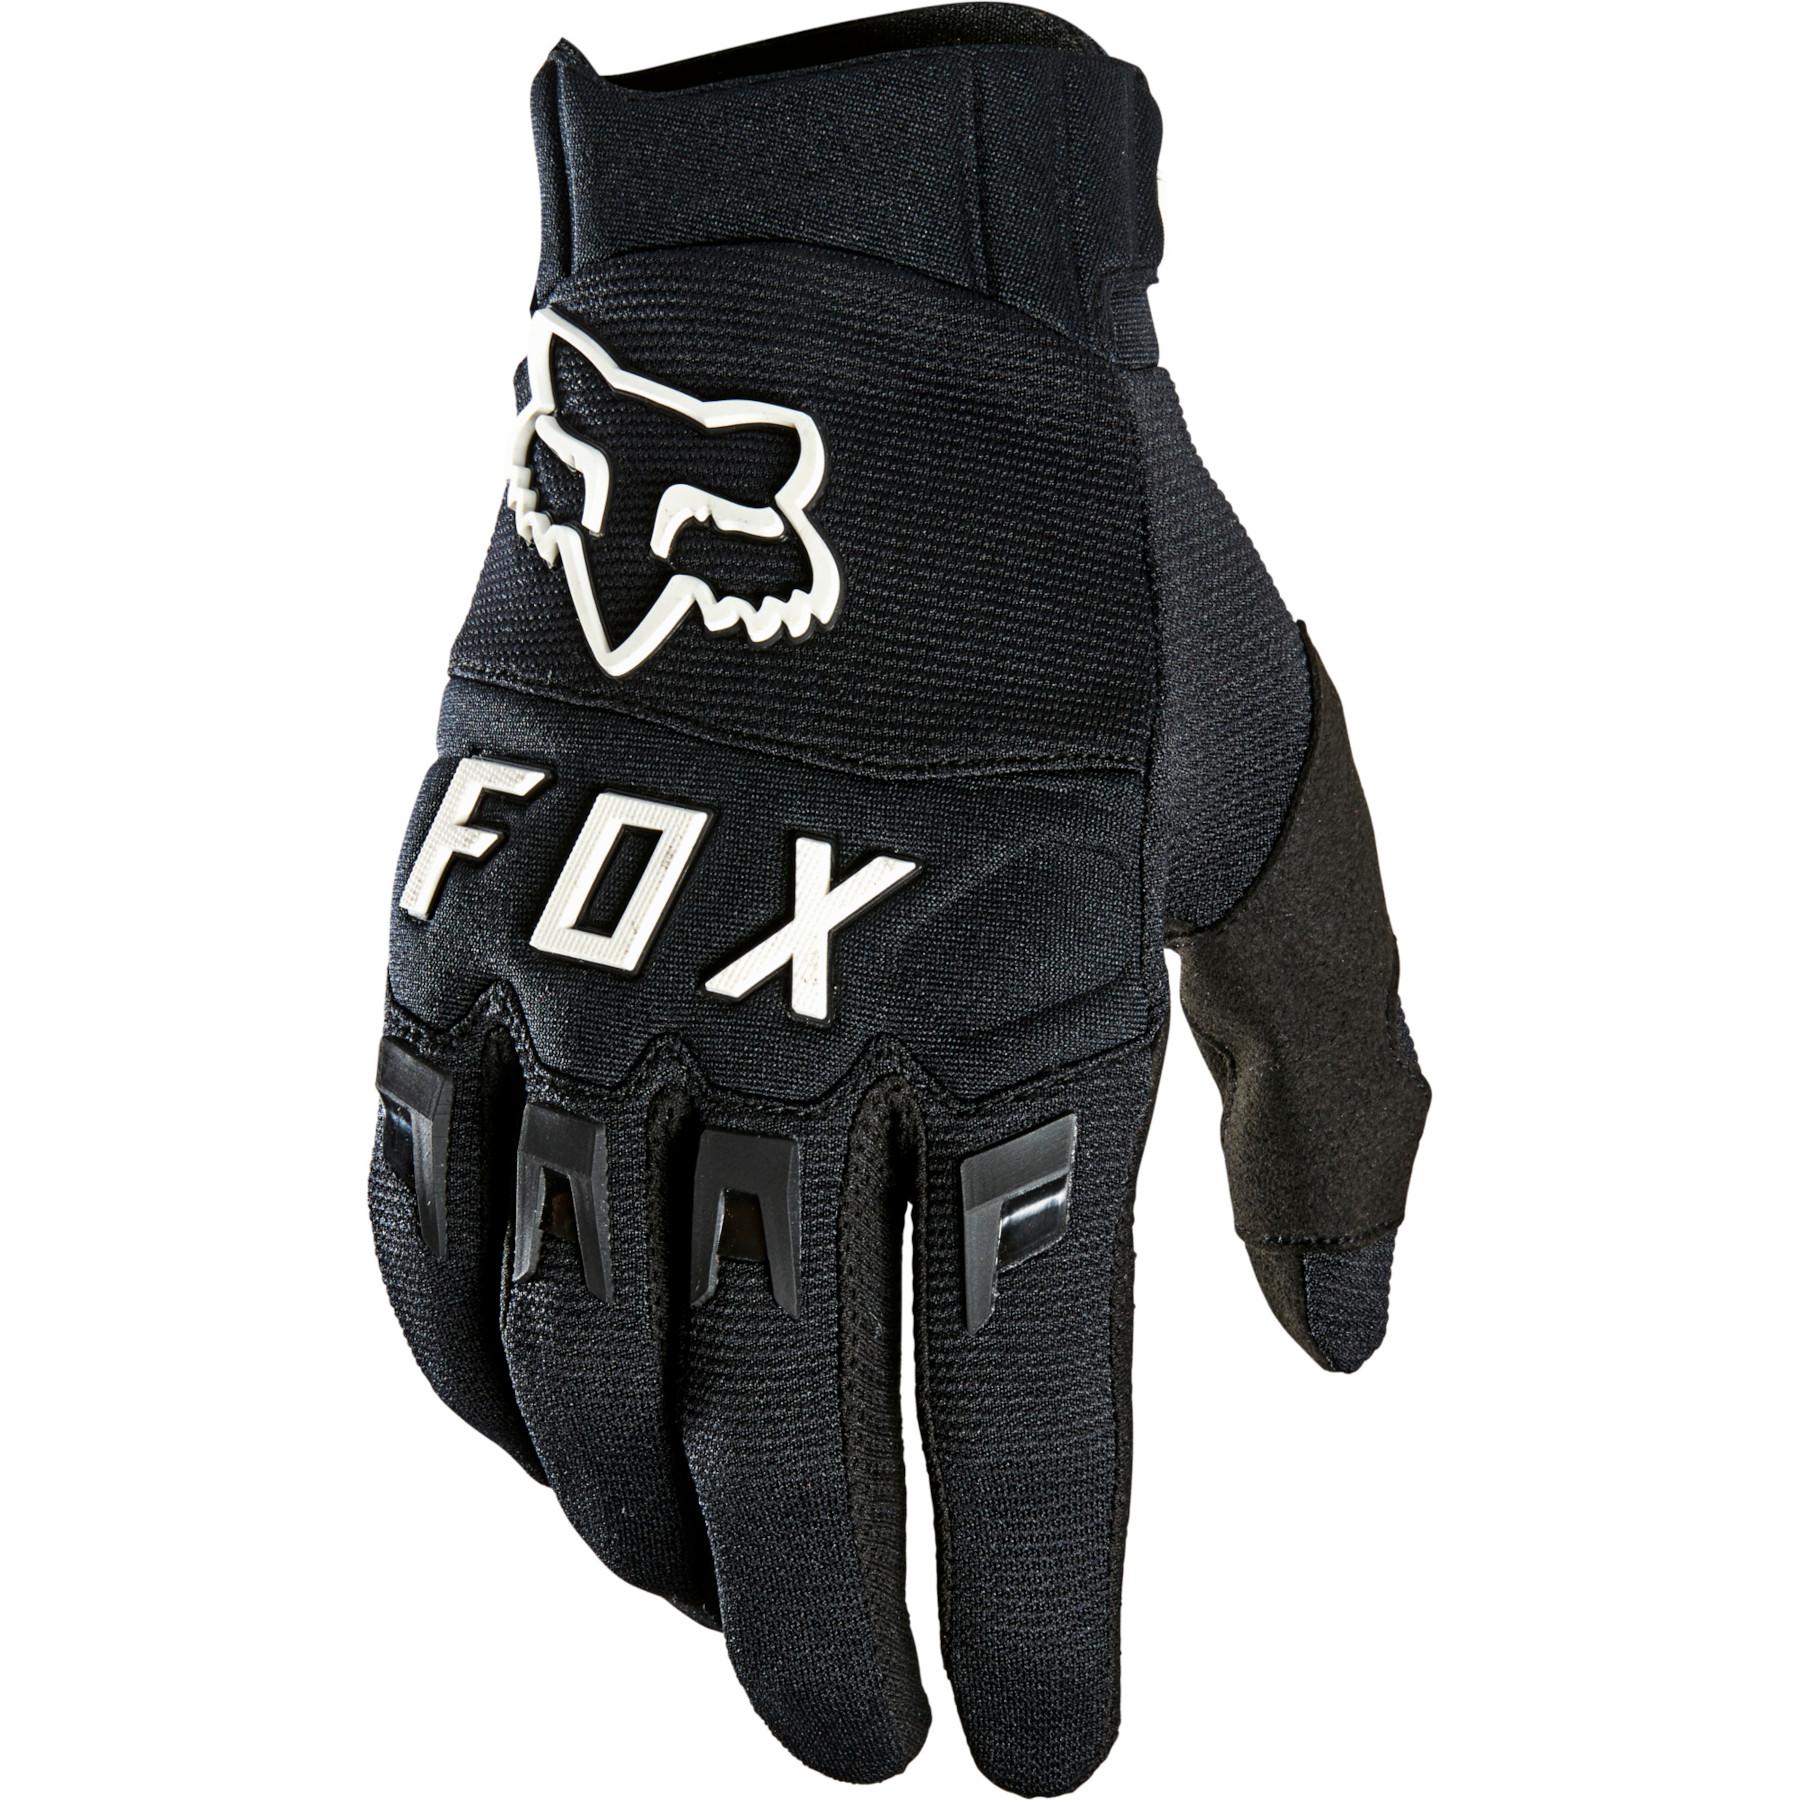 FOX Dirtpaw MTB Vollfinger Handschuh - black/white